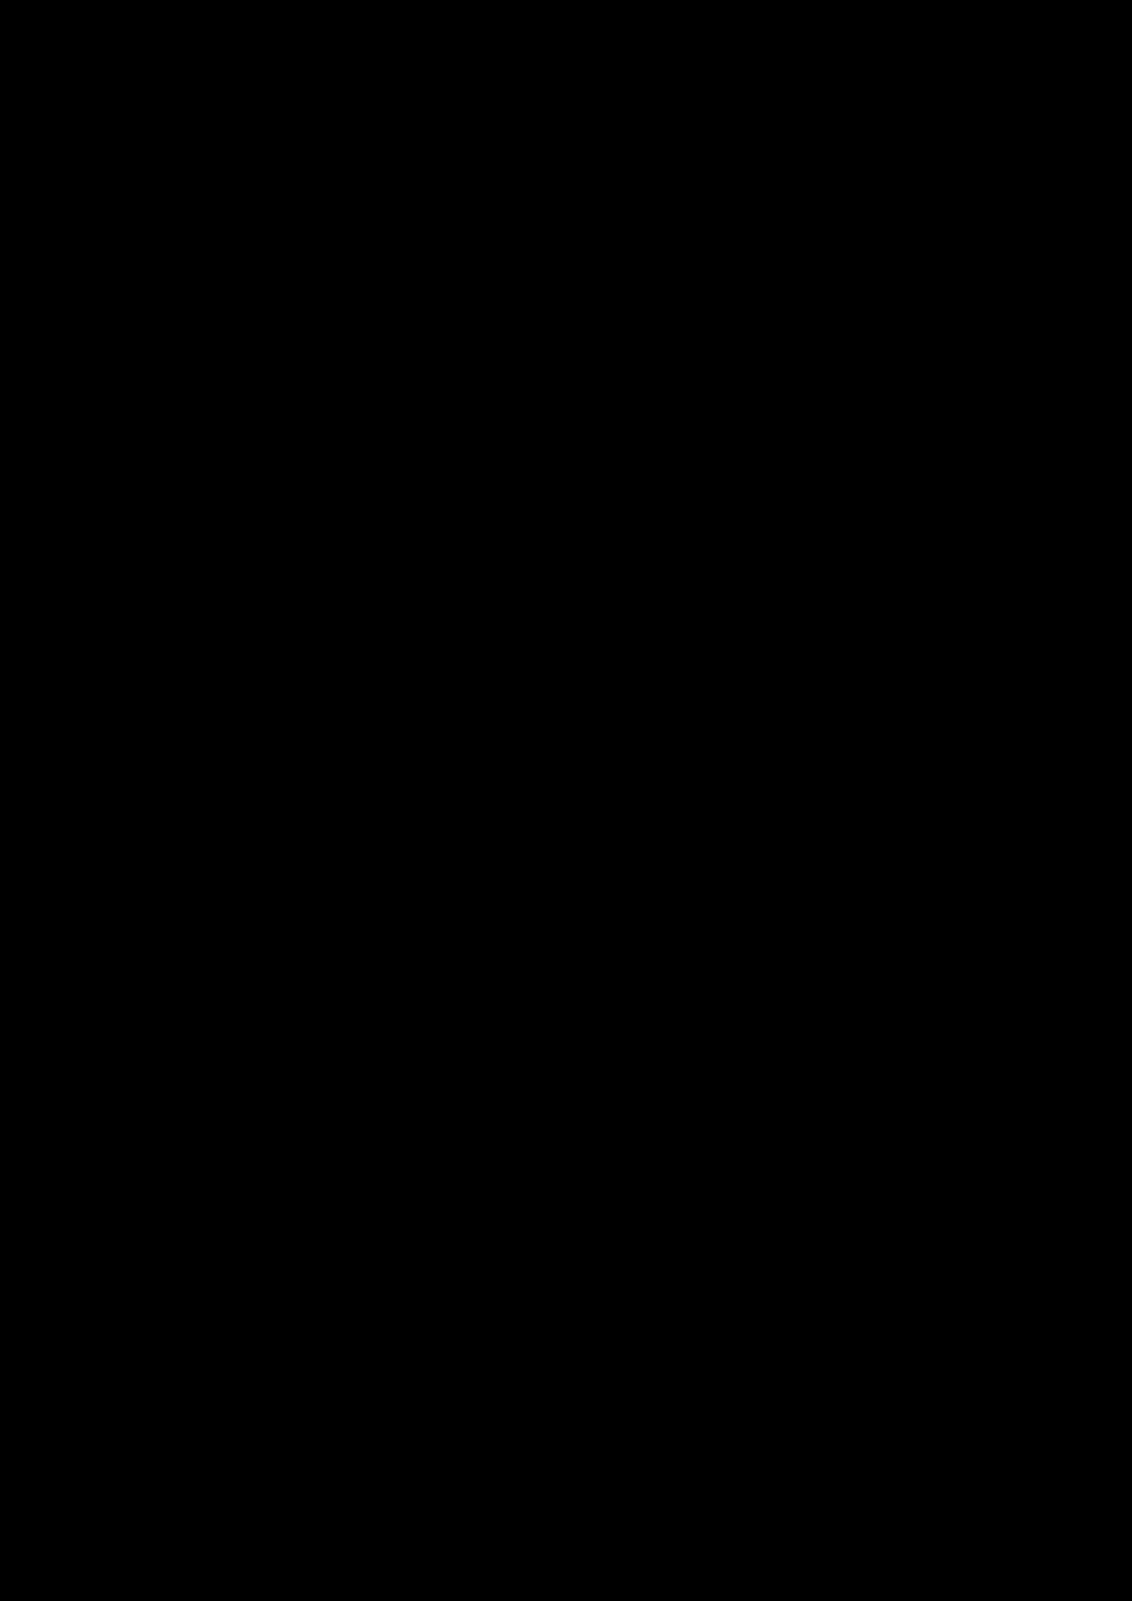 Korolevstvo slez slide, Image 82